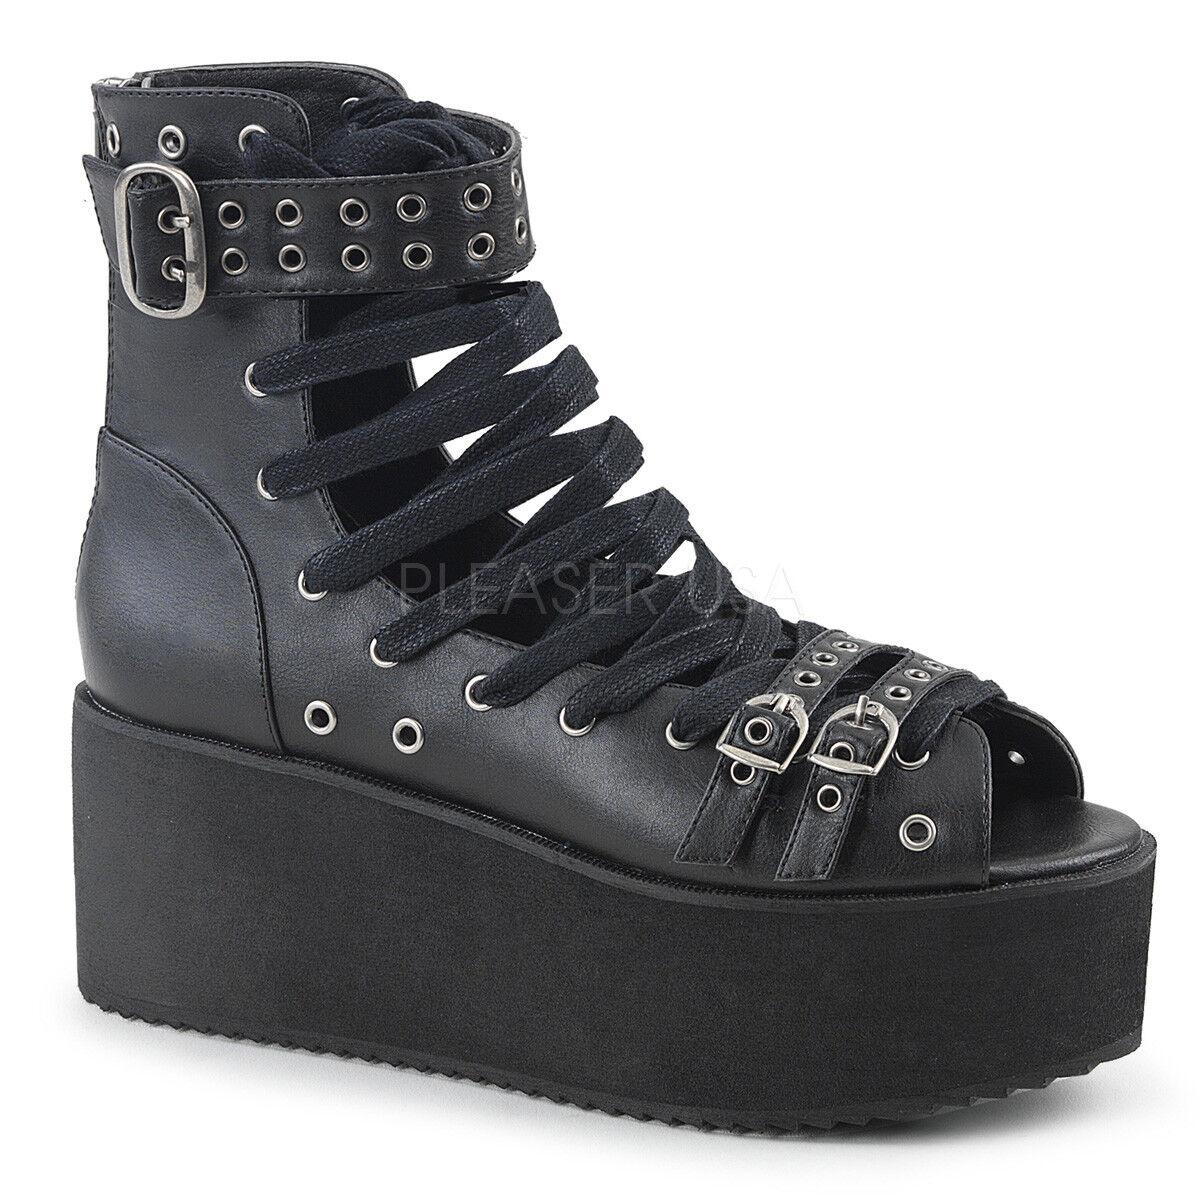 Demonia 2.75  Vegan Platform Laced Buckle Strap Sandals Stiefelies Club Punk 6-11